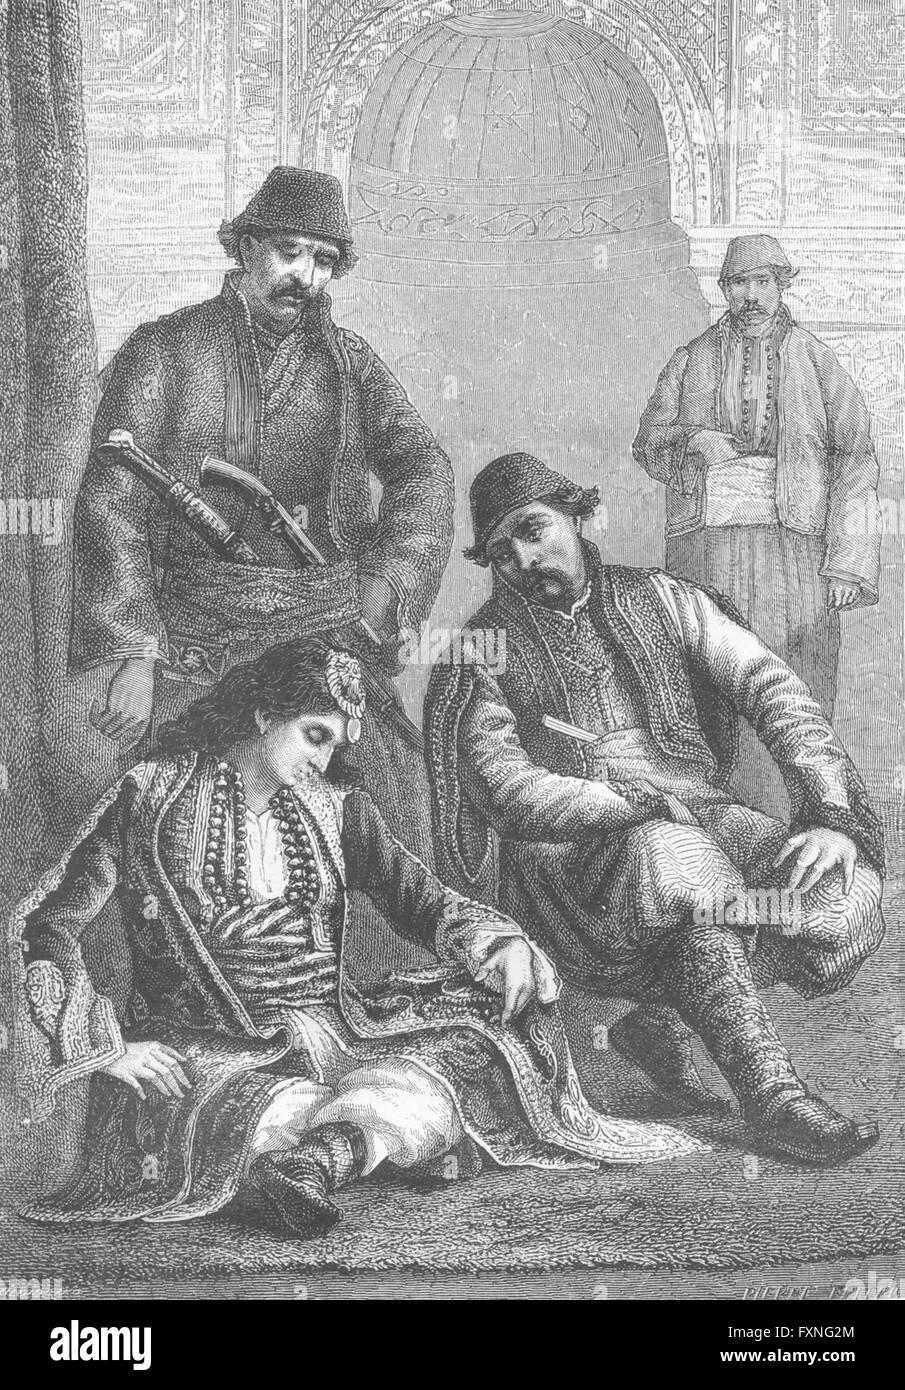 Turchia: Musulmana di Edirne & lady Prisrend, antica stampa c1885 Immagini Stock